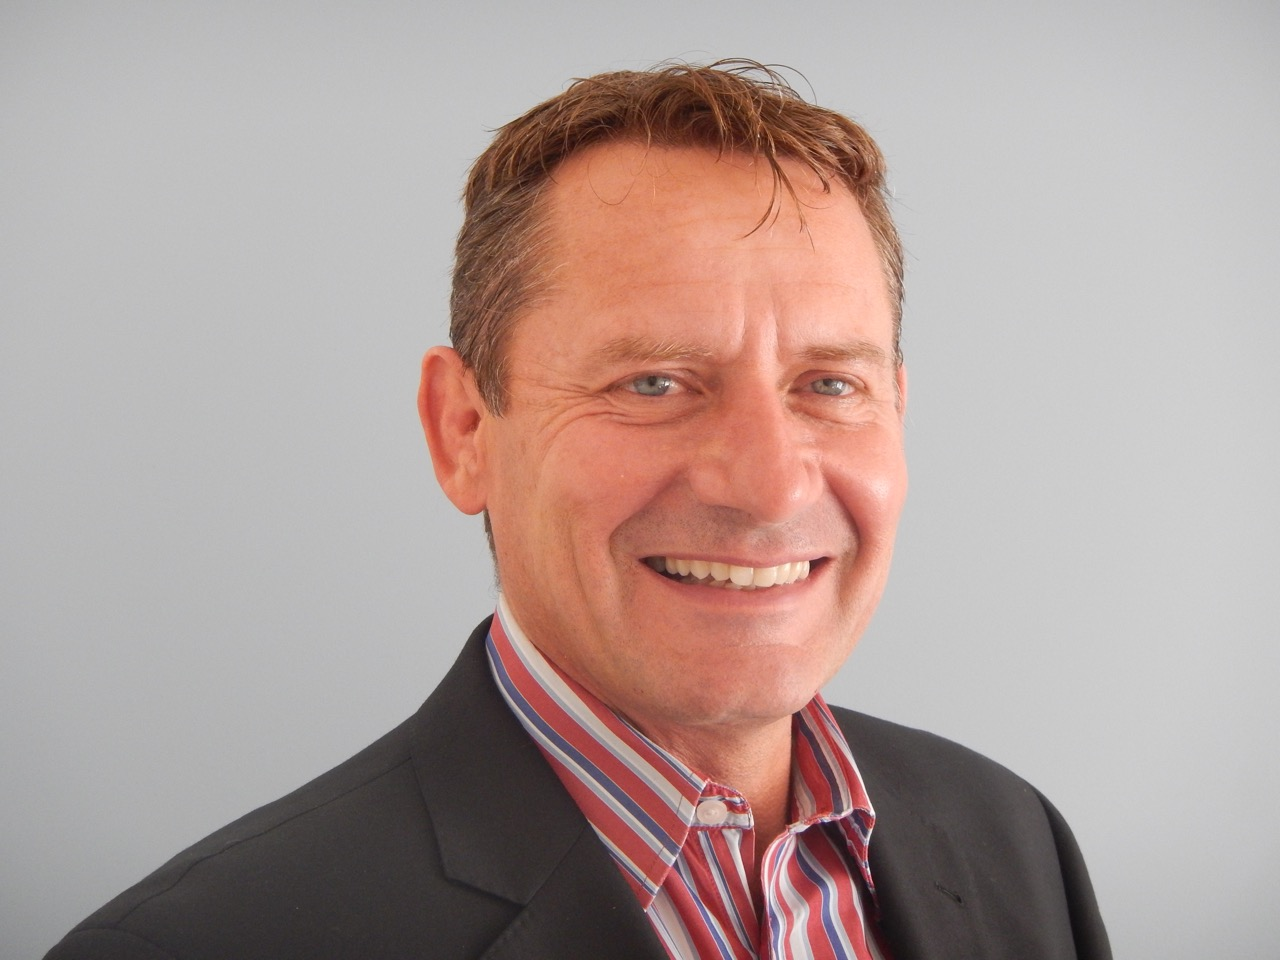 IABNZ CEO, Adrian Pickstock, announced as Judge of the Broadband Compare Awards